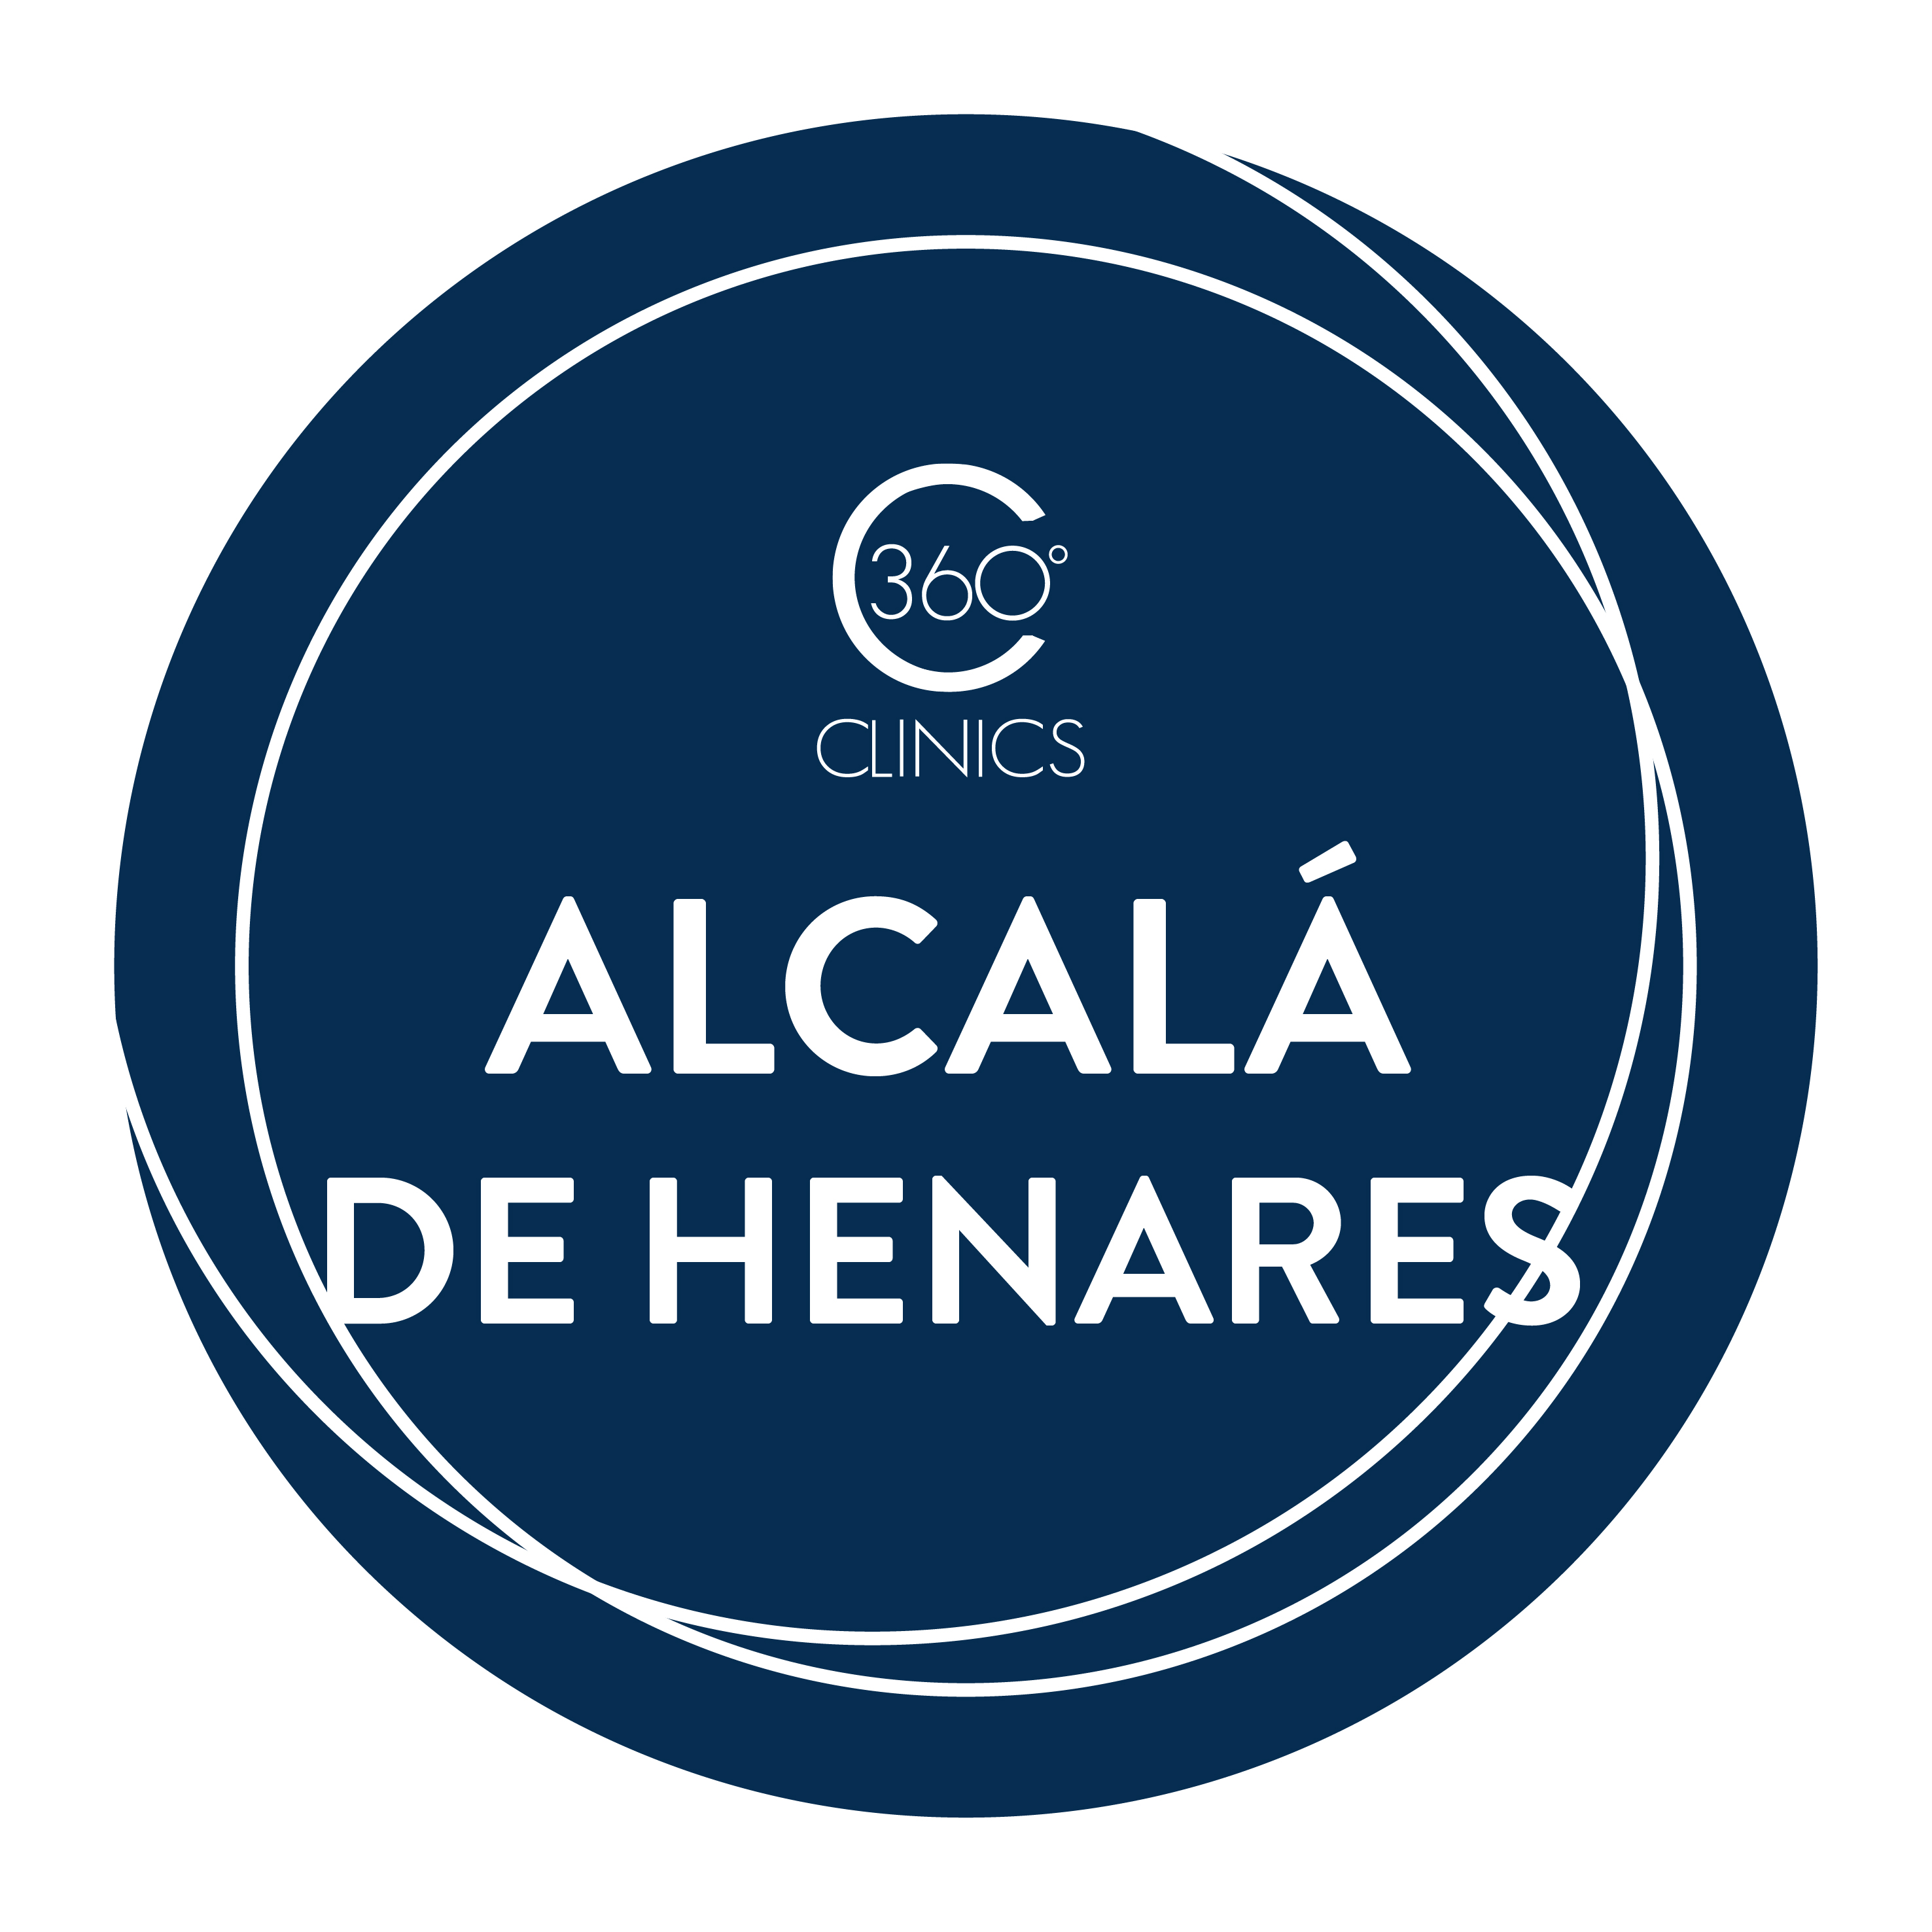 Centros de depilación láser en Alcalá de Henares